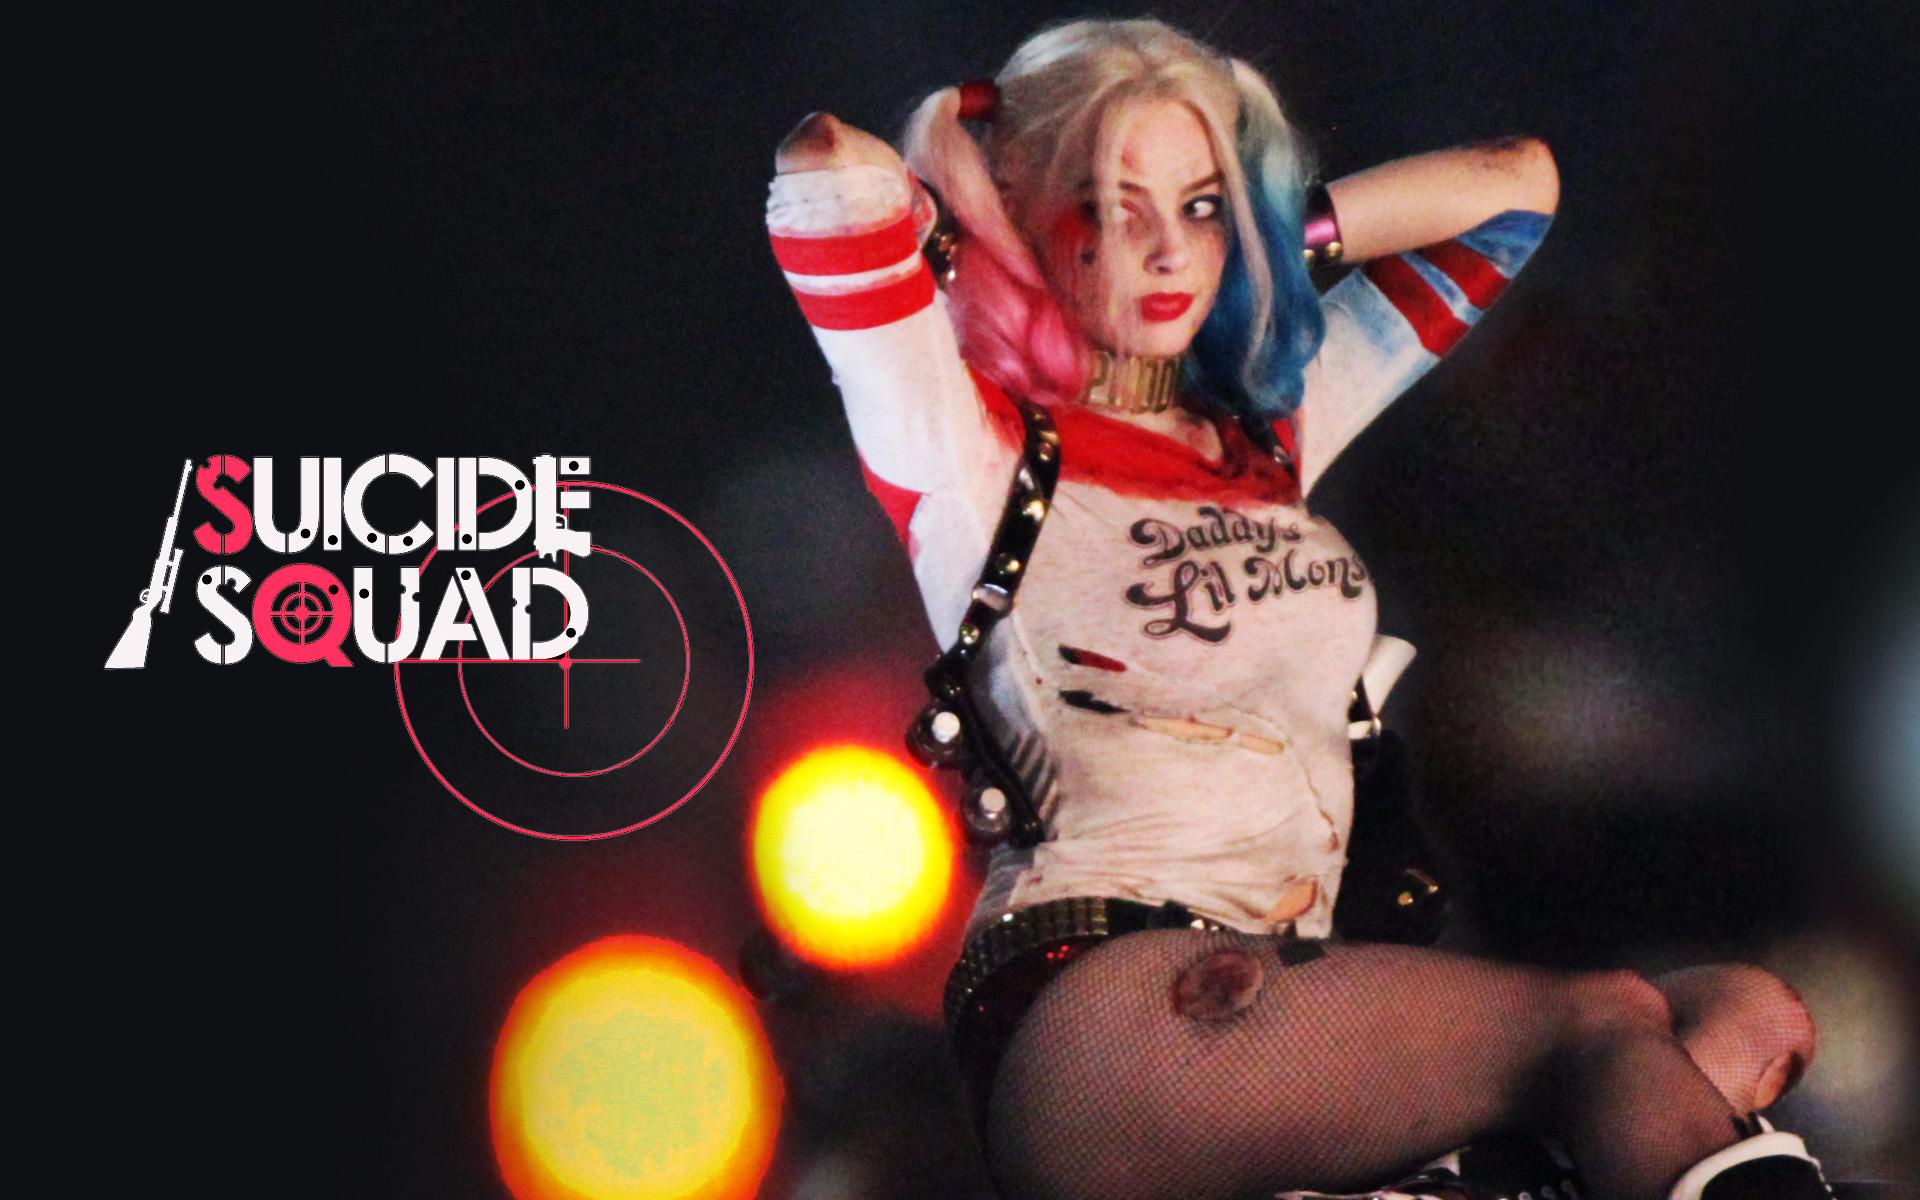 Harley Quinn Suicide Squad Wallpapers - WallpaperSafari